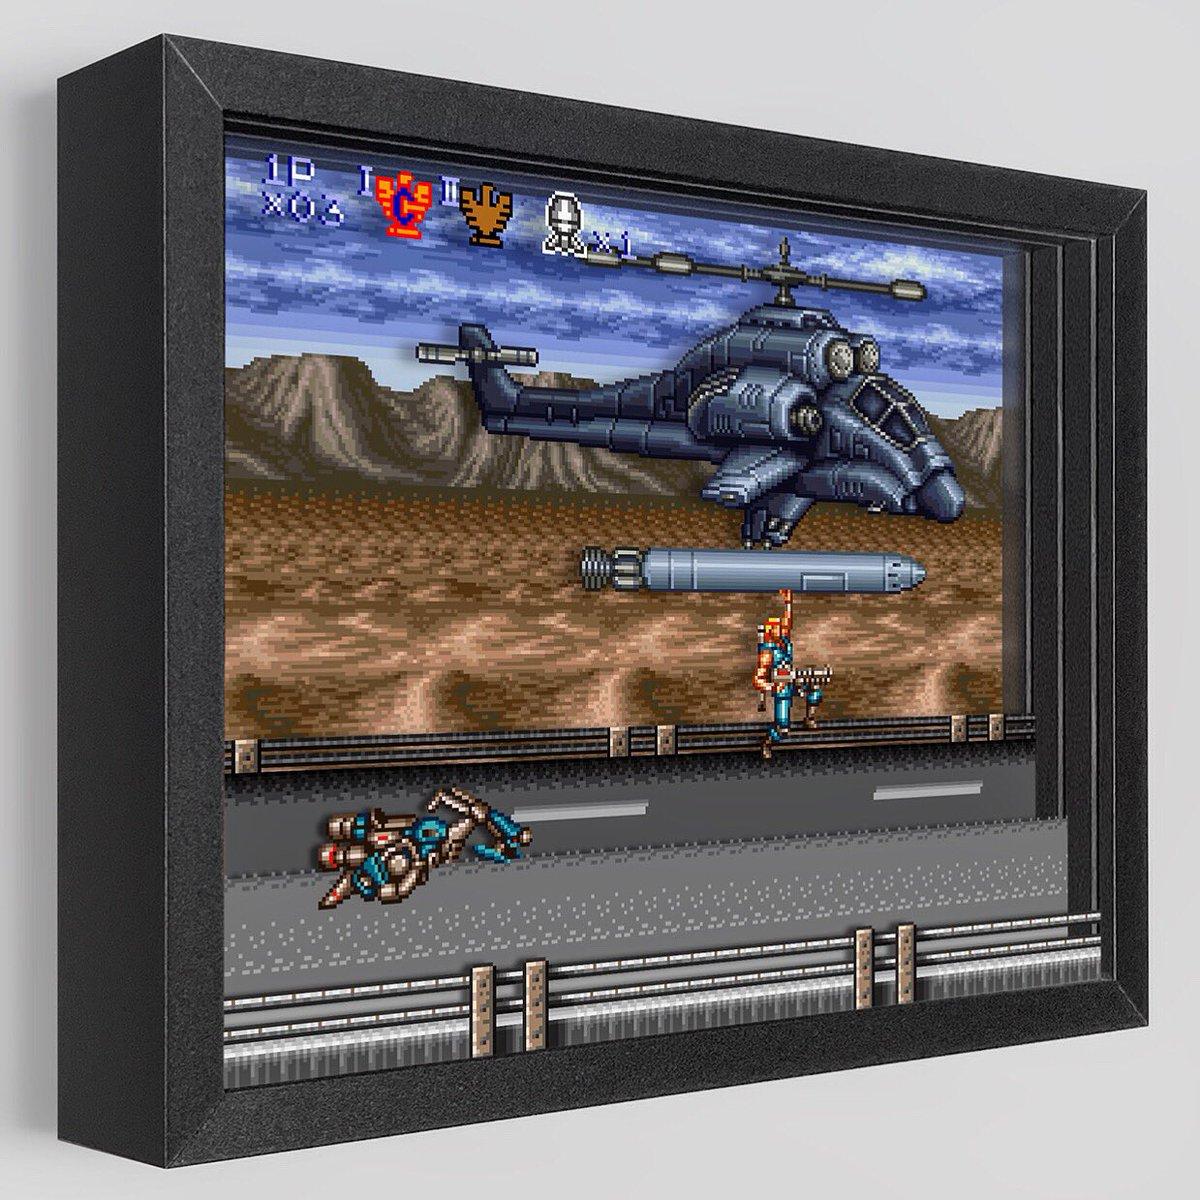 Ready for a Missile Ride? https://t.co/mI9bgyPr90  @konami #art #artwork #desktop #konami #contra #contraiii #alien #alienwars #snes #nintendo #nintendolife #game #gamer #gamerguy #gamergirls #gameboy #invasion #invader #new #official #redfalcon #helicopter #missile #ride https://t.co/Gn7oQn7spq